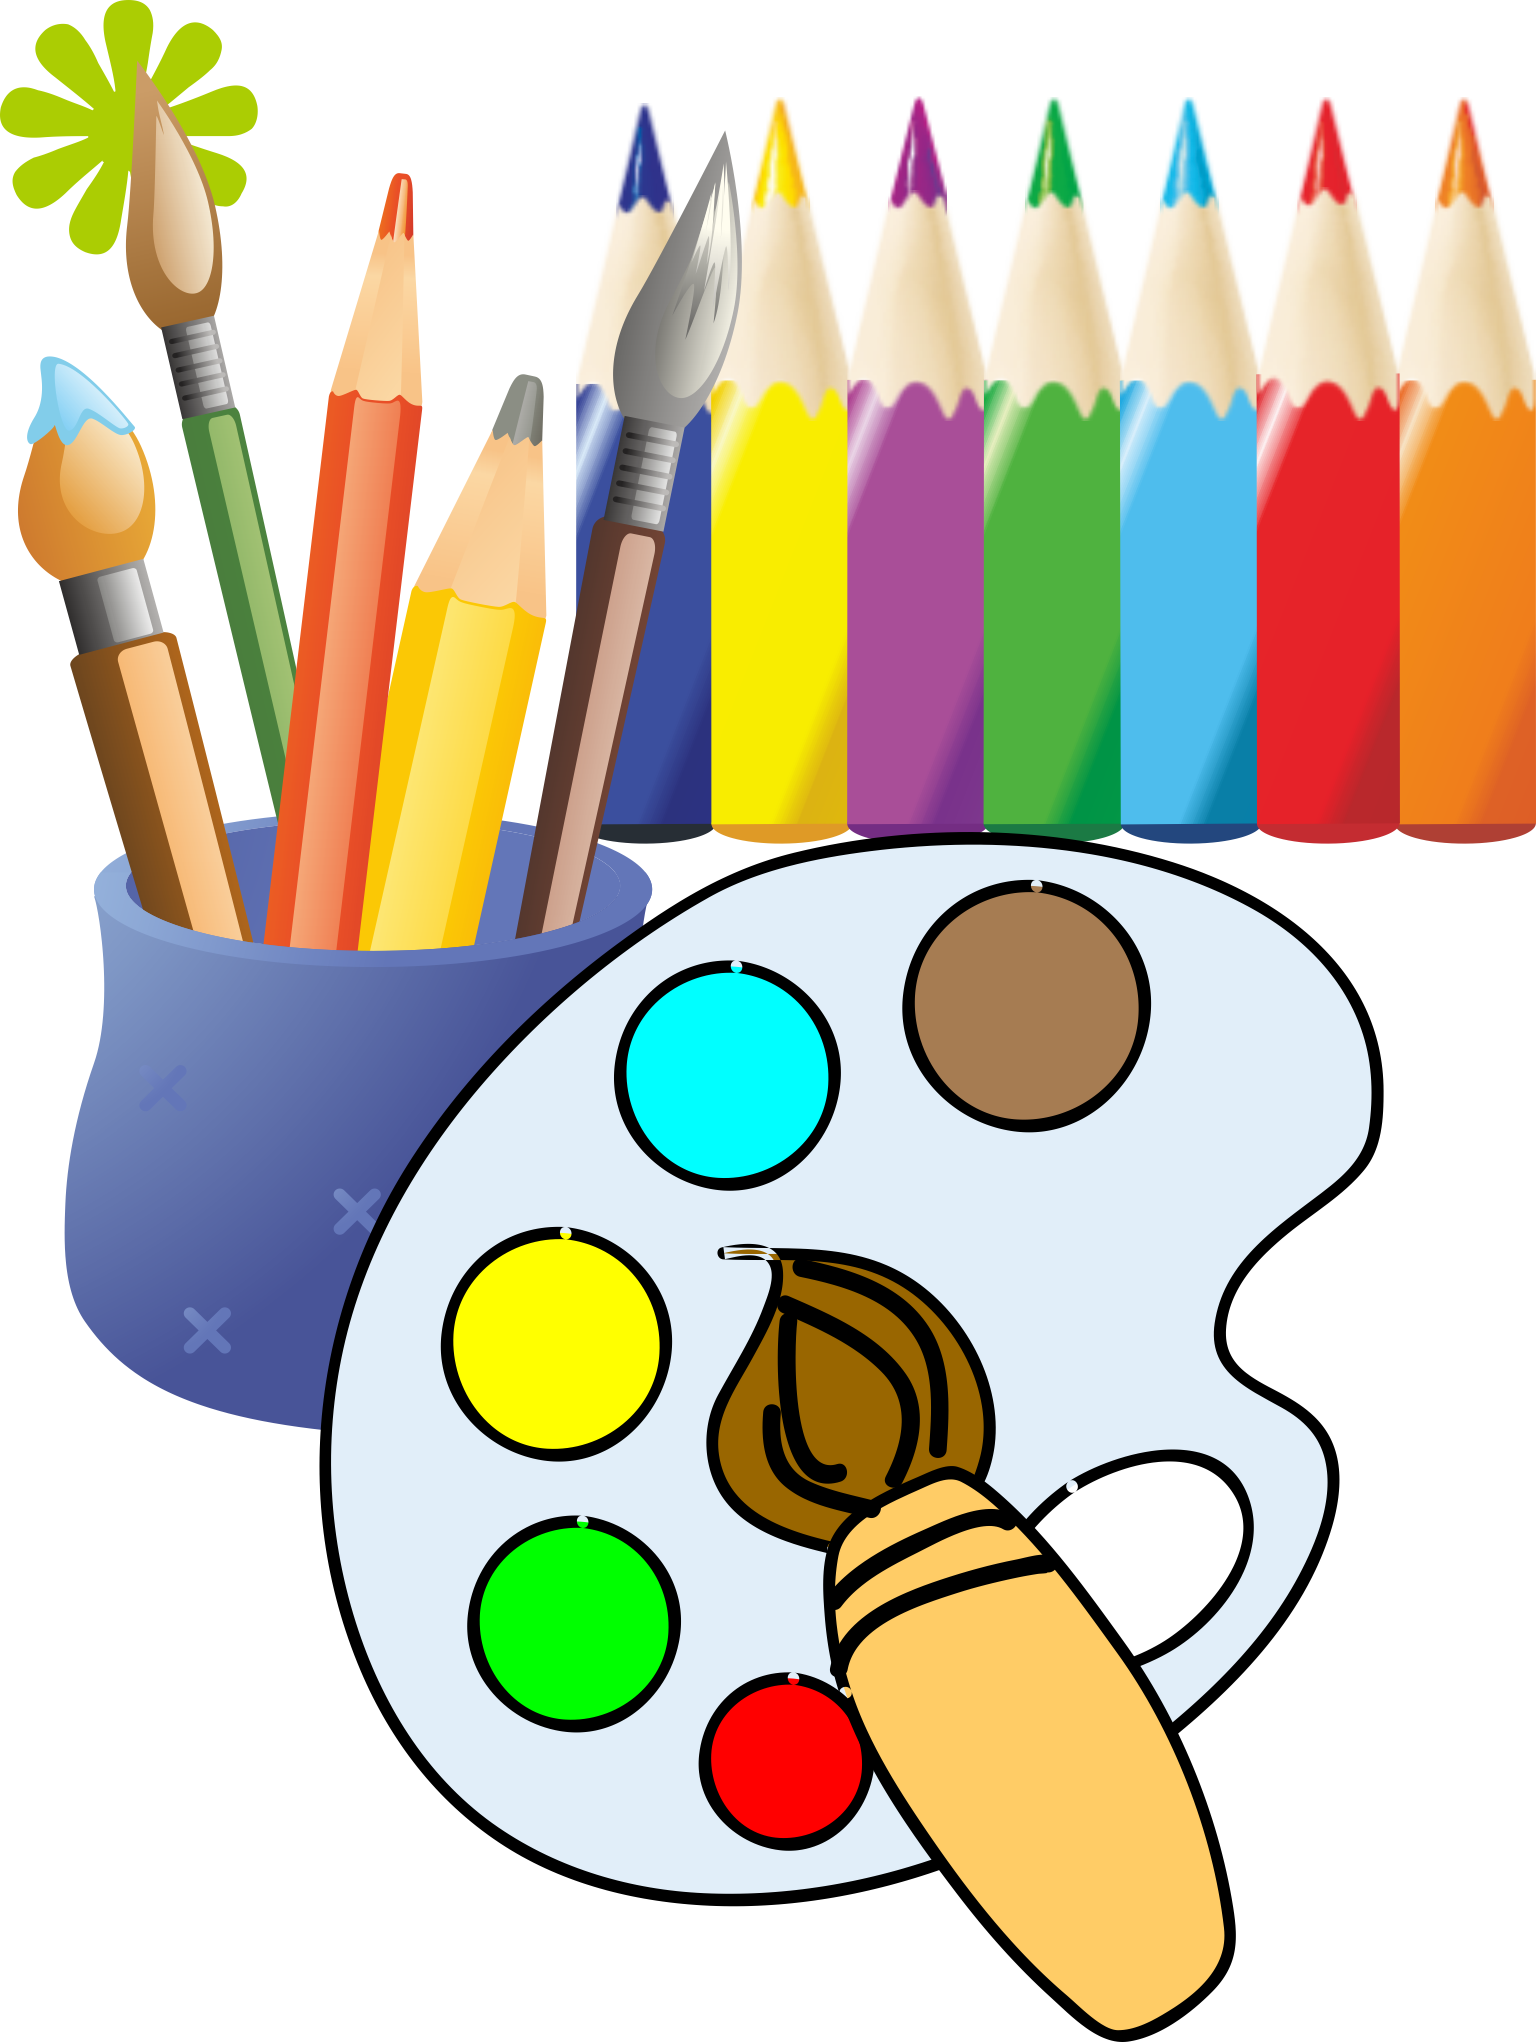 Paintbrush clipart artwork. Painting drawing clip art